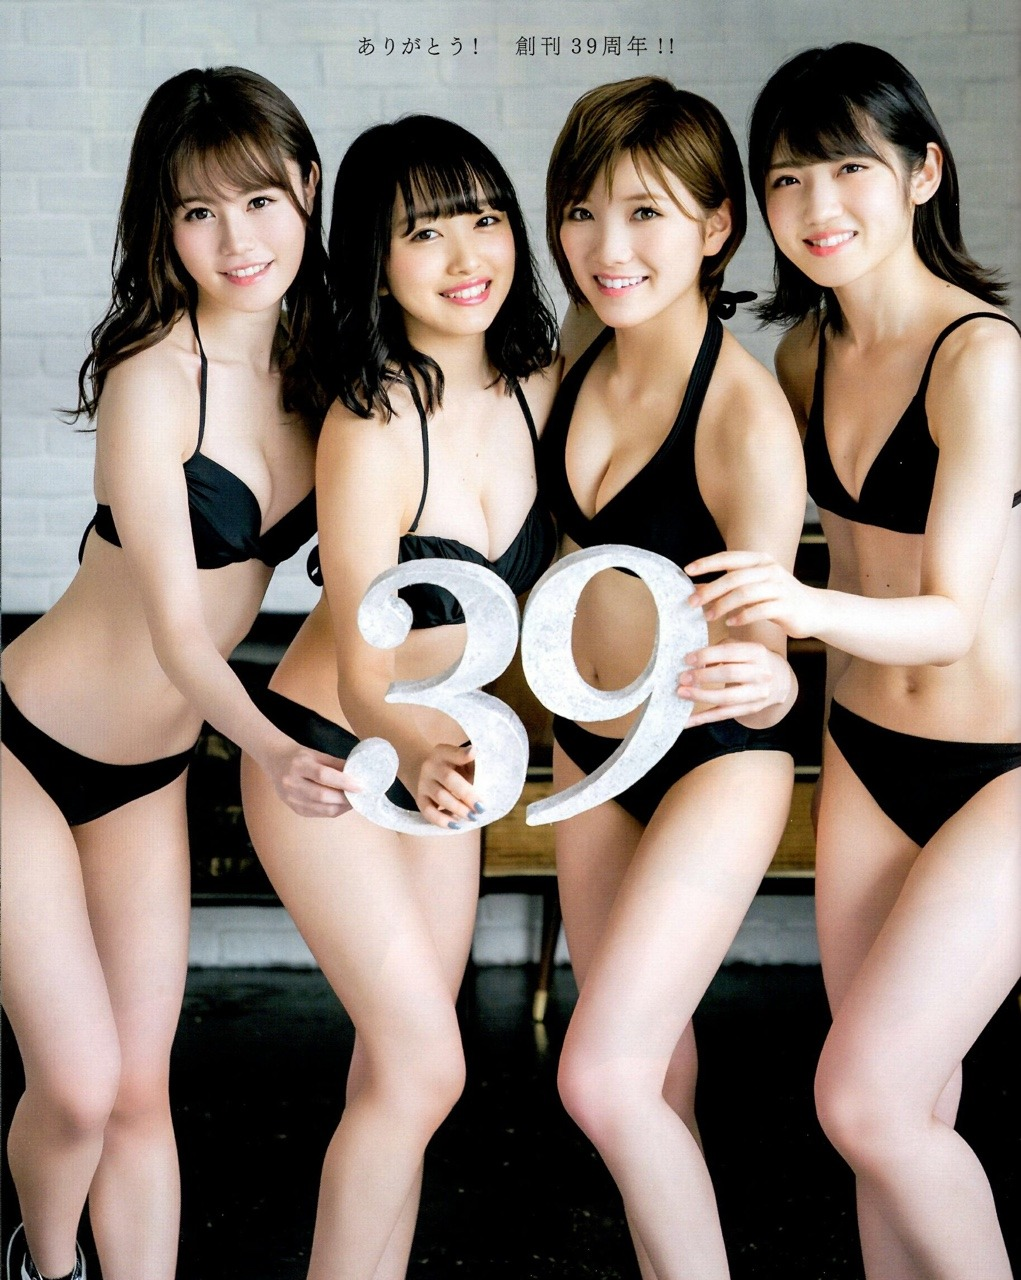 AKB48, BOMB! 2018 No.04 (ボム 2018年4月号) Okada Nana 岡田奈々, Murayama Yuiri 村山彩希, Mukaichi Mion 向井地美音, Komiyama Haruka 込山榛香